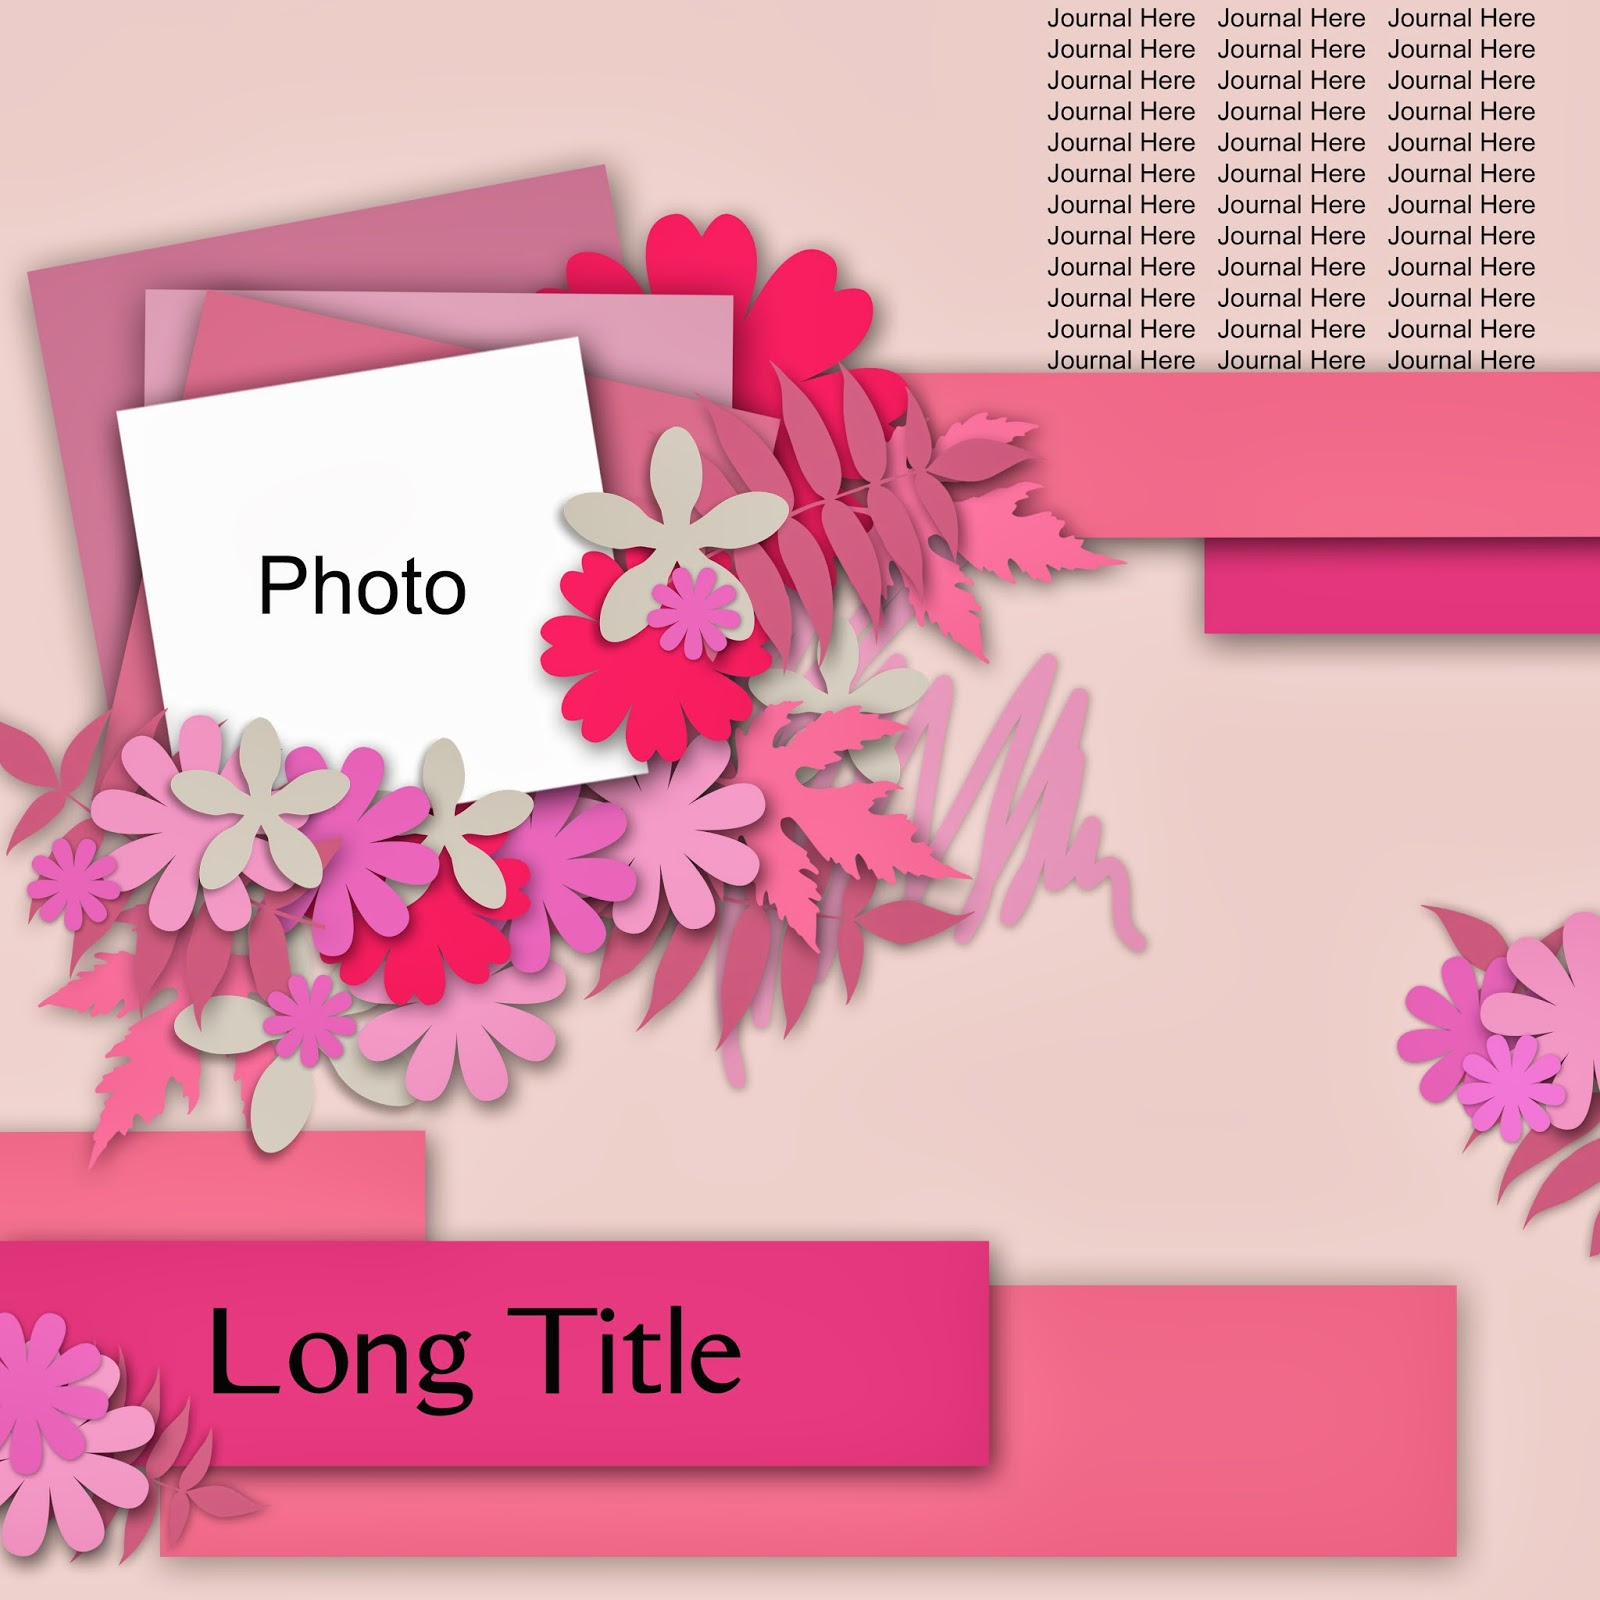 http://2.bp.blogspot.com/-8XQqHGctkxM/Uy3zCWnI3-I/AAAAAAAAAWk/UXlP9FE0rsE/s1600/03_22_14_edited-1.jpg